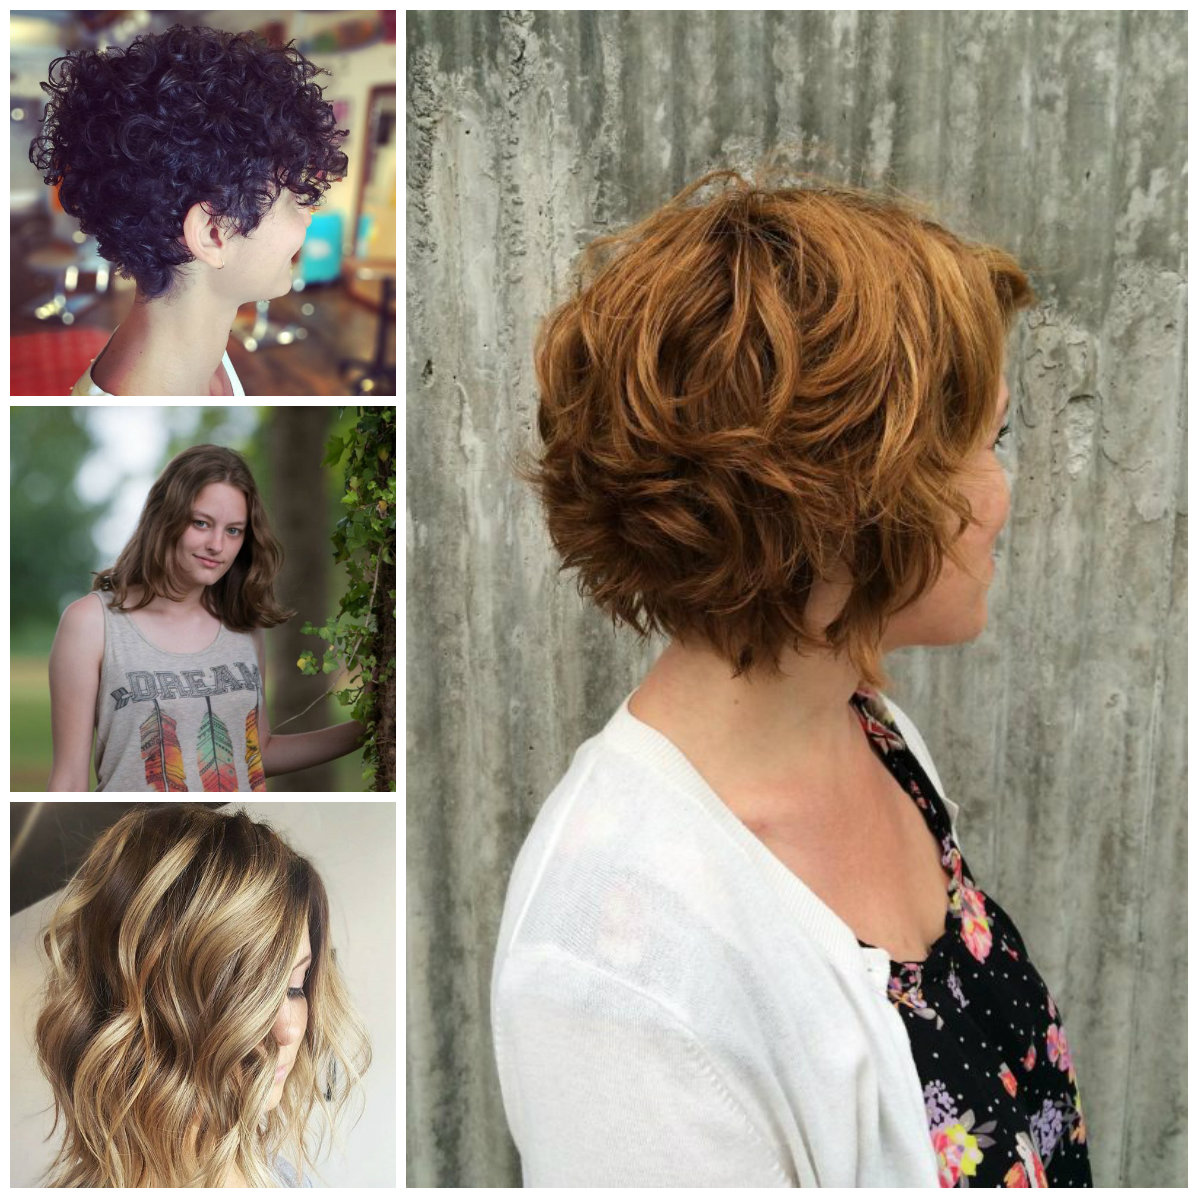 Stylish Short Wavy Hairstyle for 2017